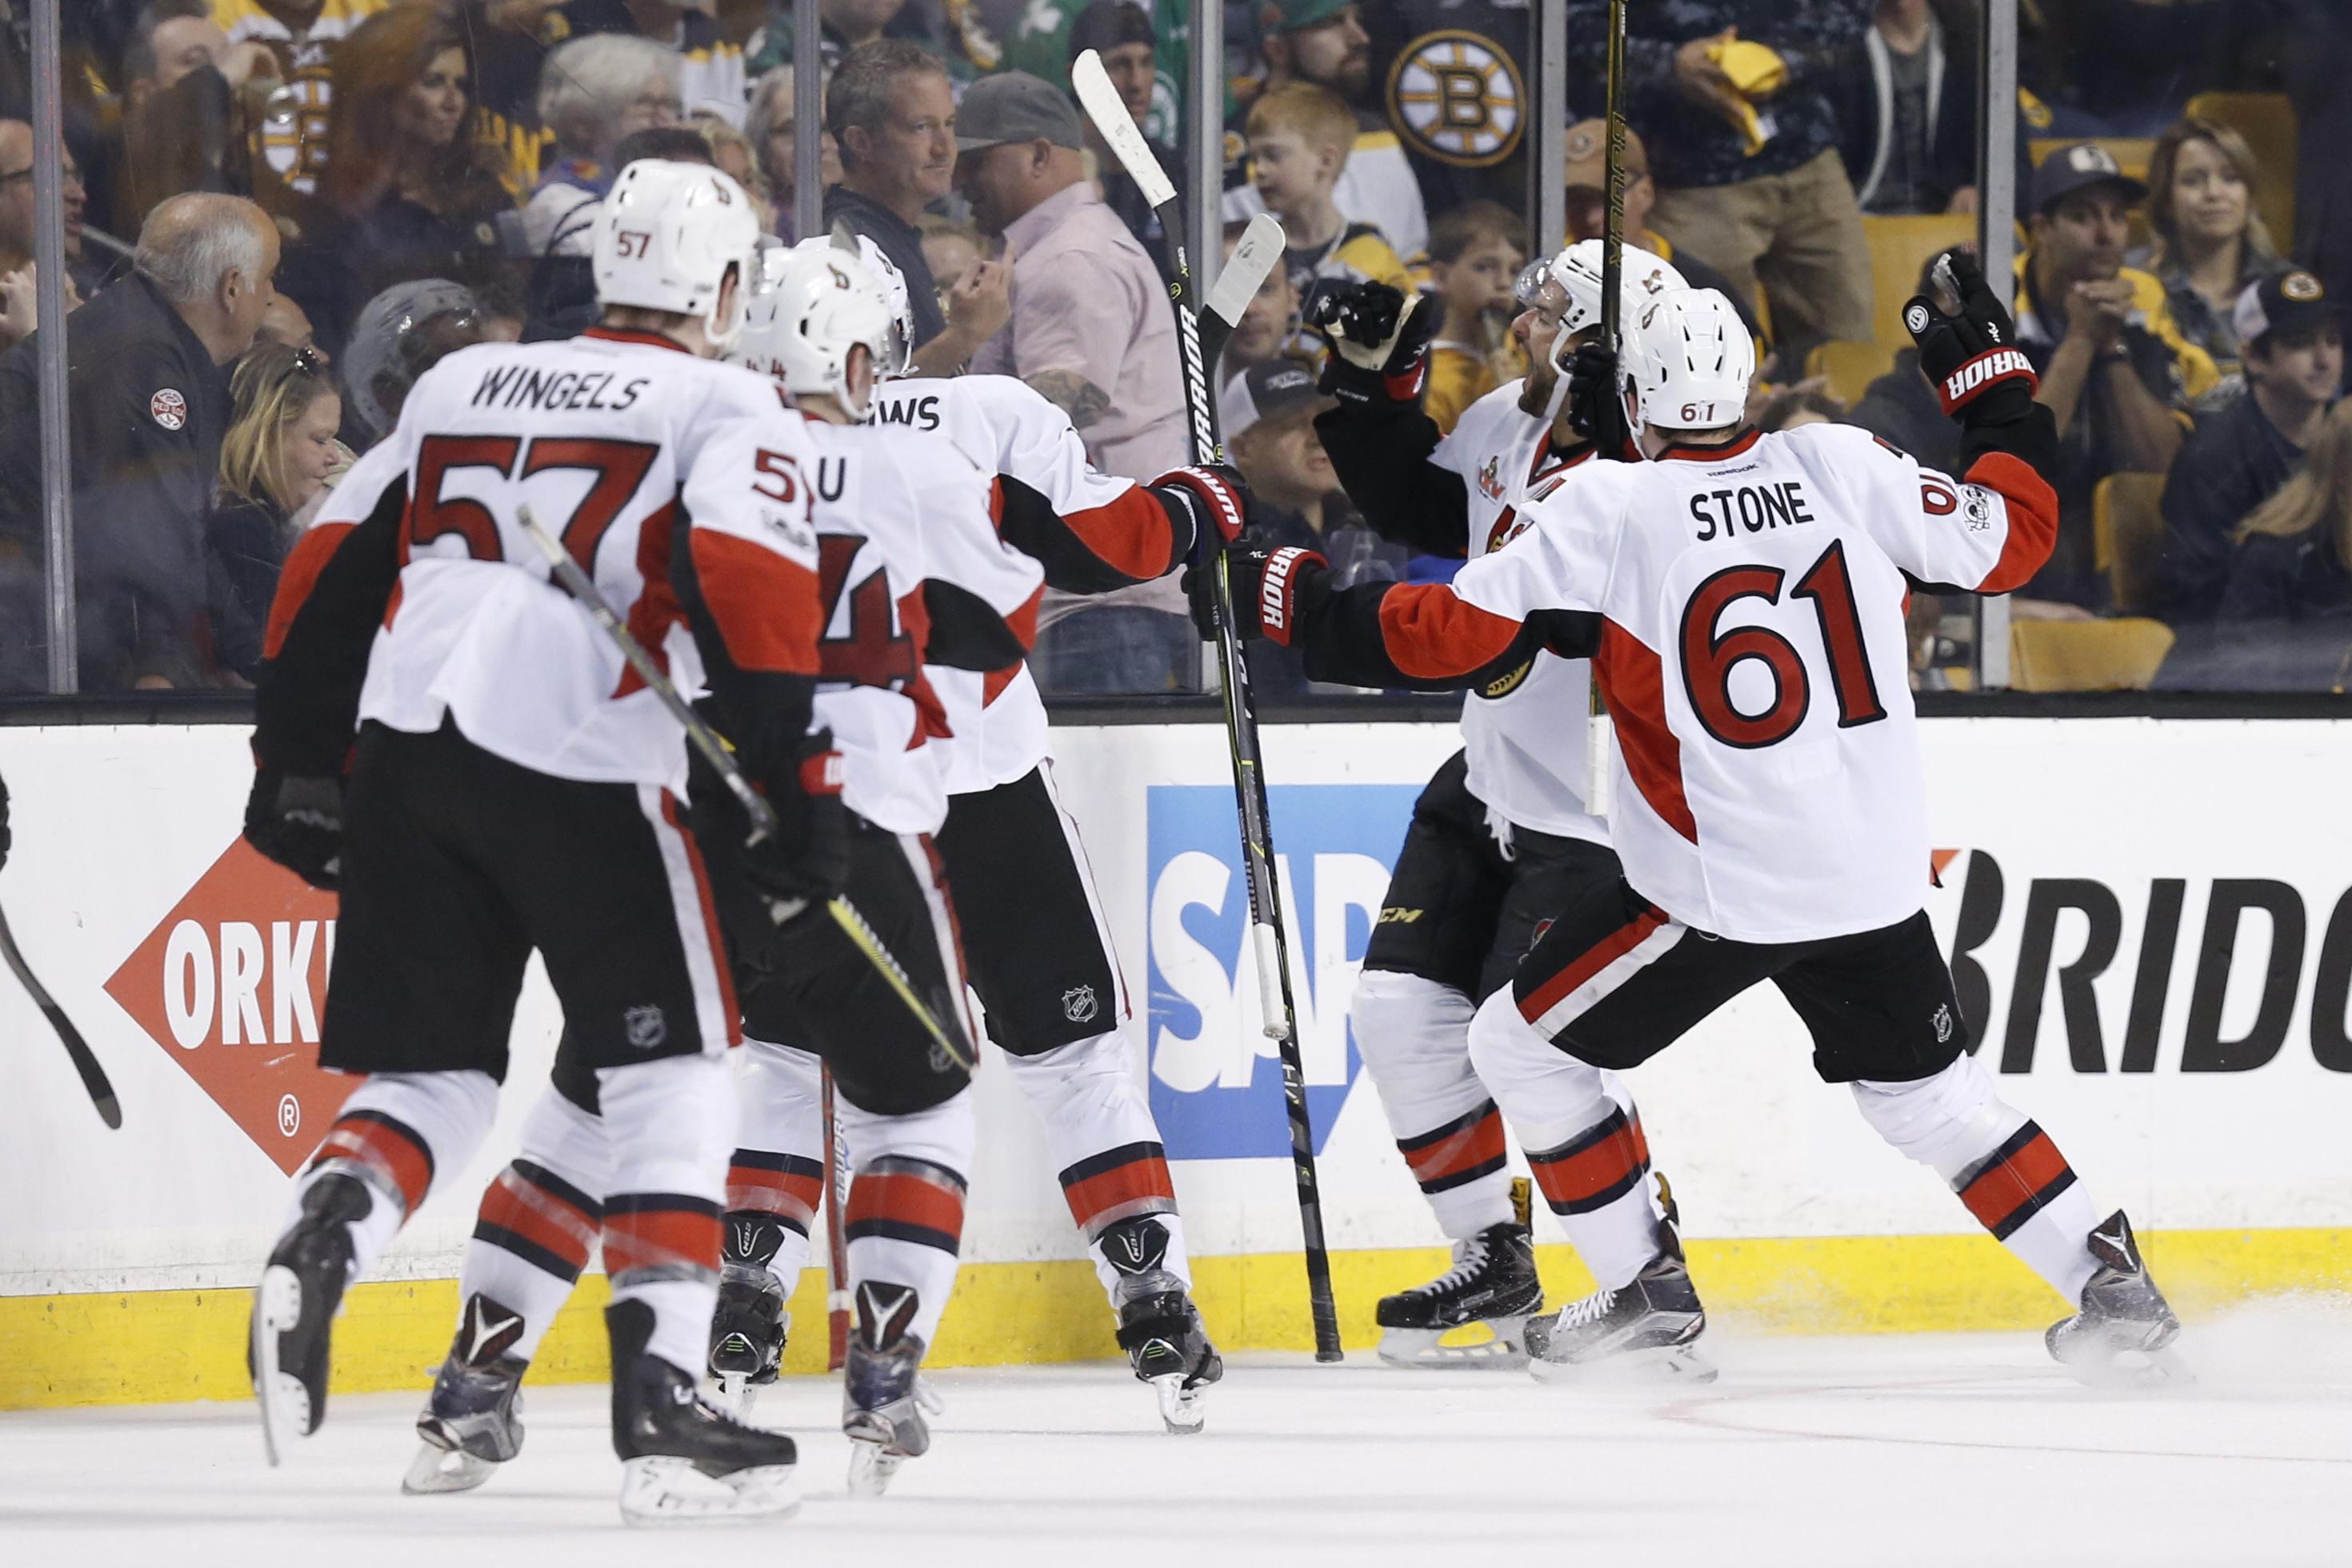 Karlsson helps Senators edge Rangers 2-1 in Game 1